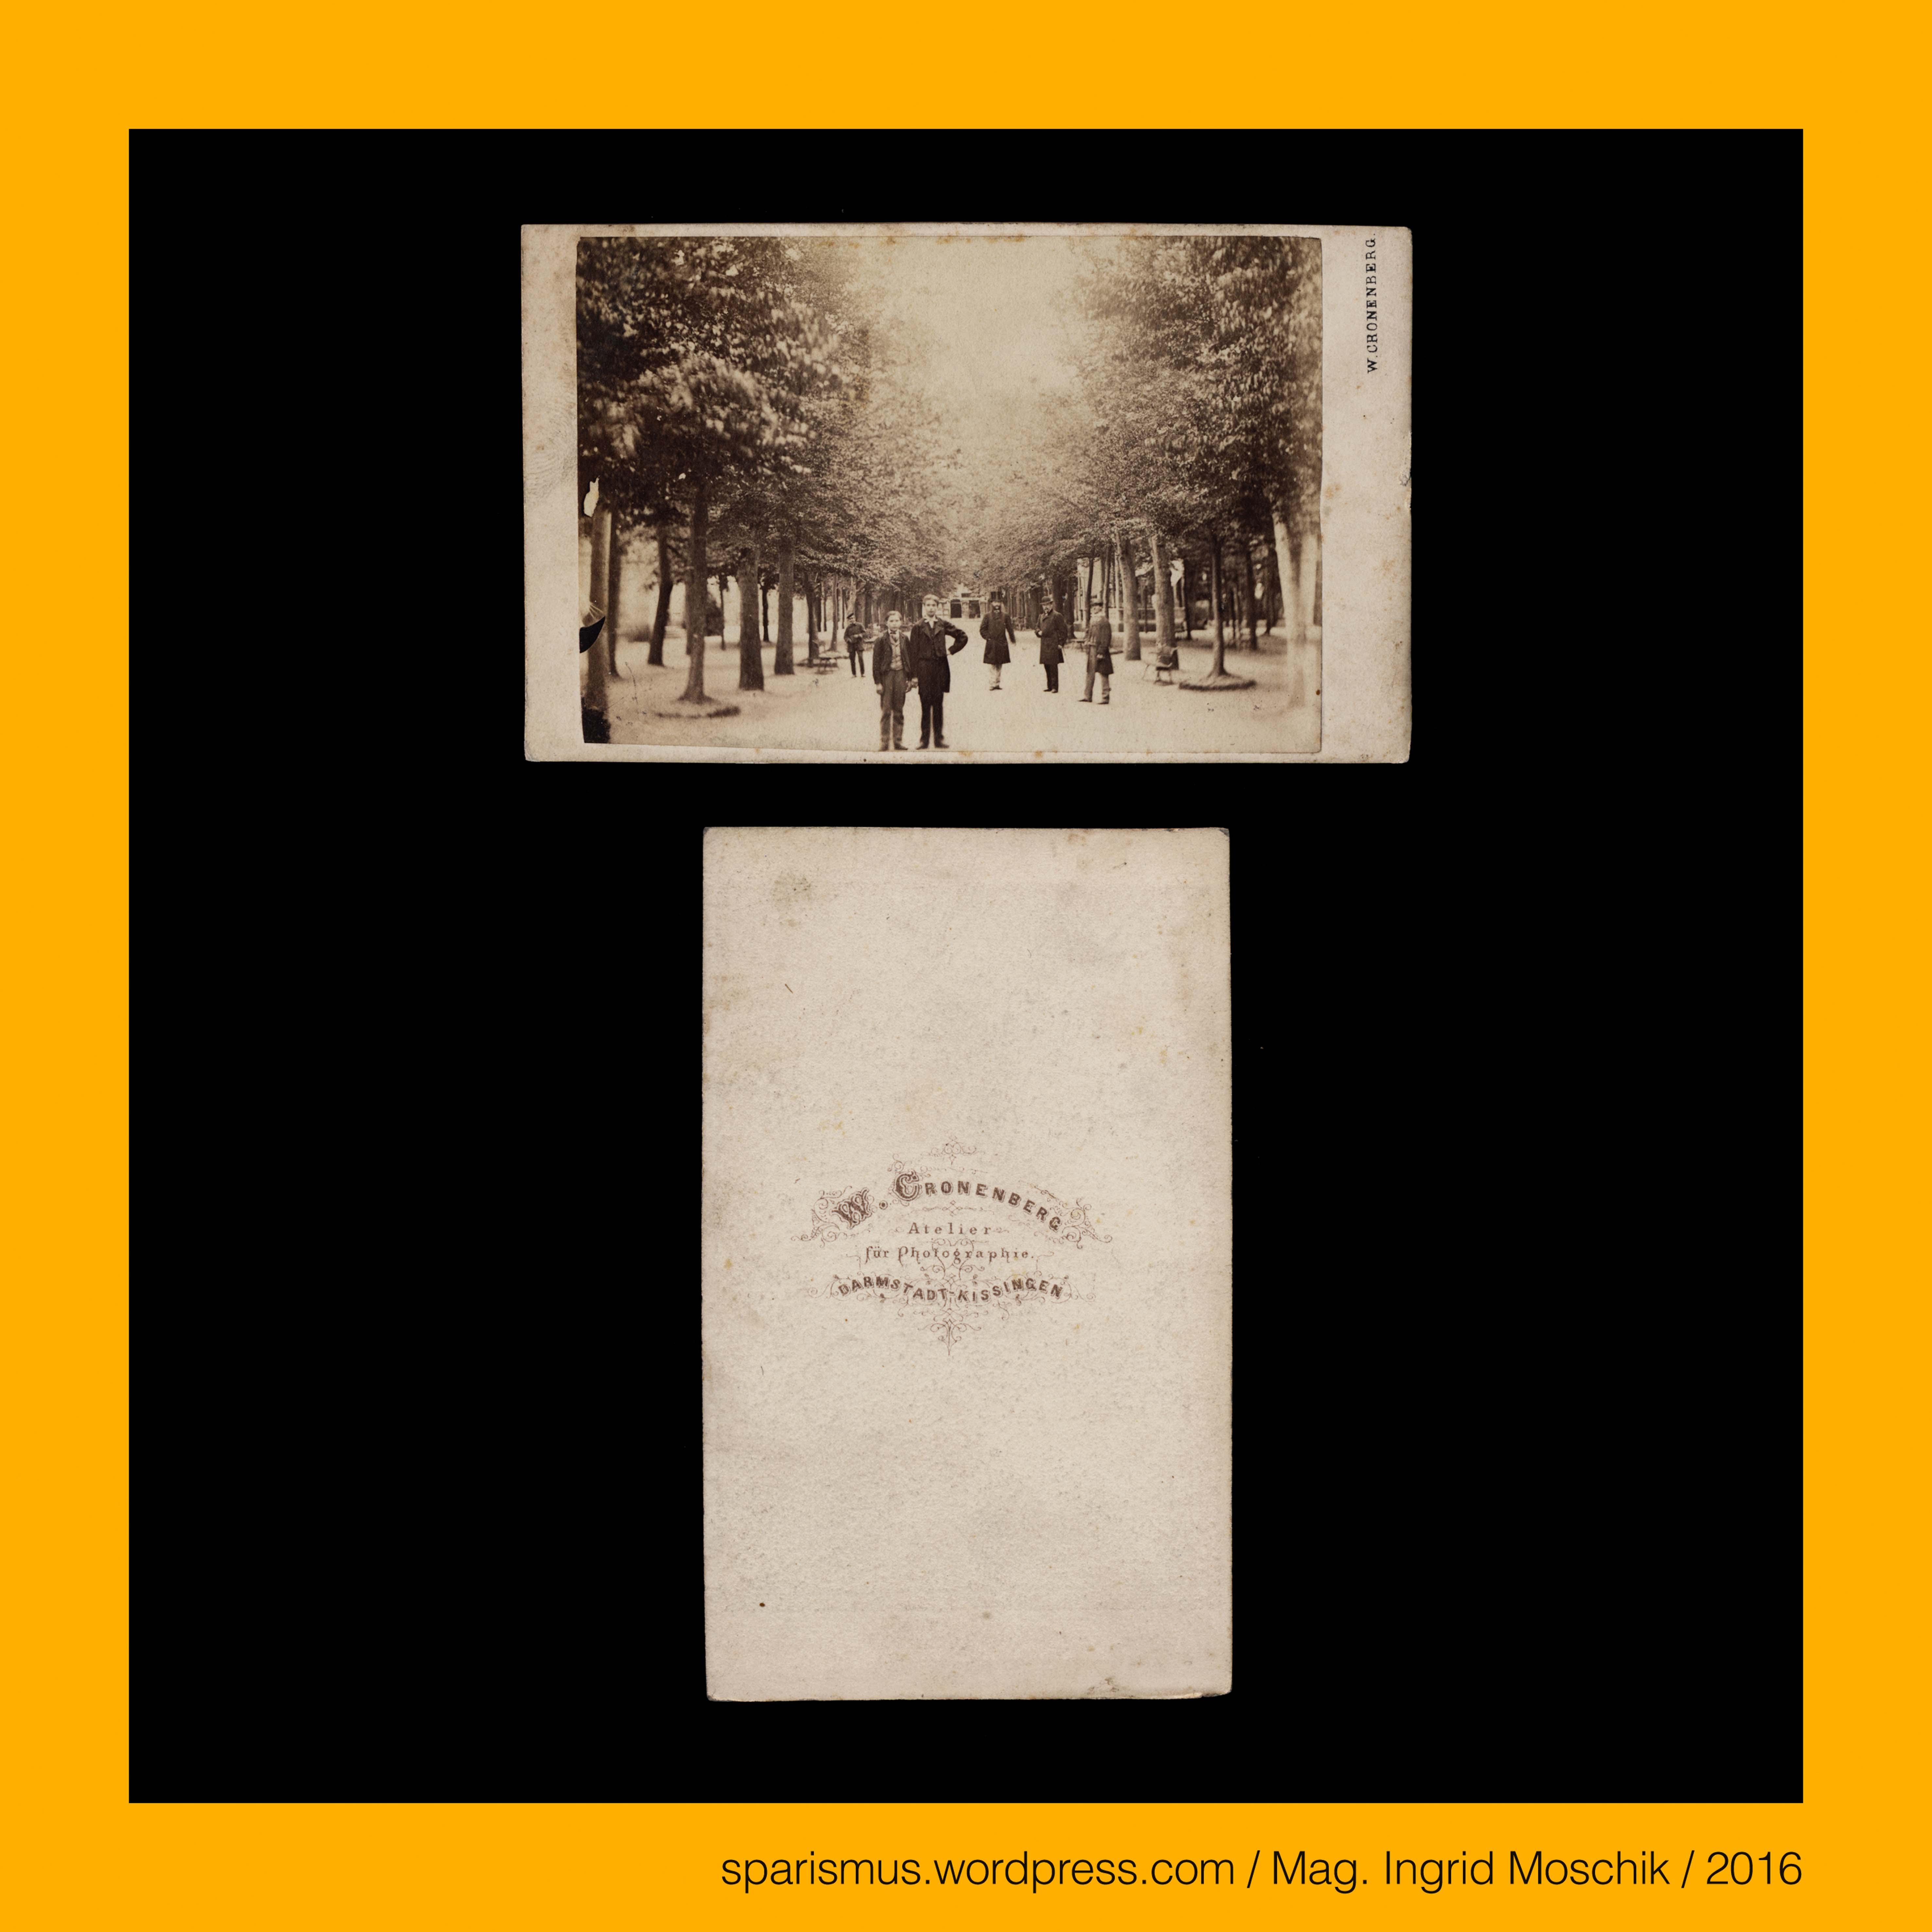 "W CRONENBERG Wilhelm Cronenberg = Wilhelm Kronenberg Wilhelm Cronenberg 1836 Frankfurt am Main """